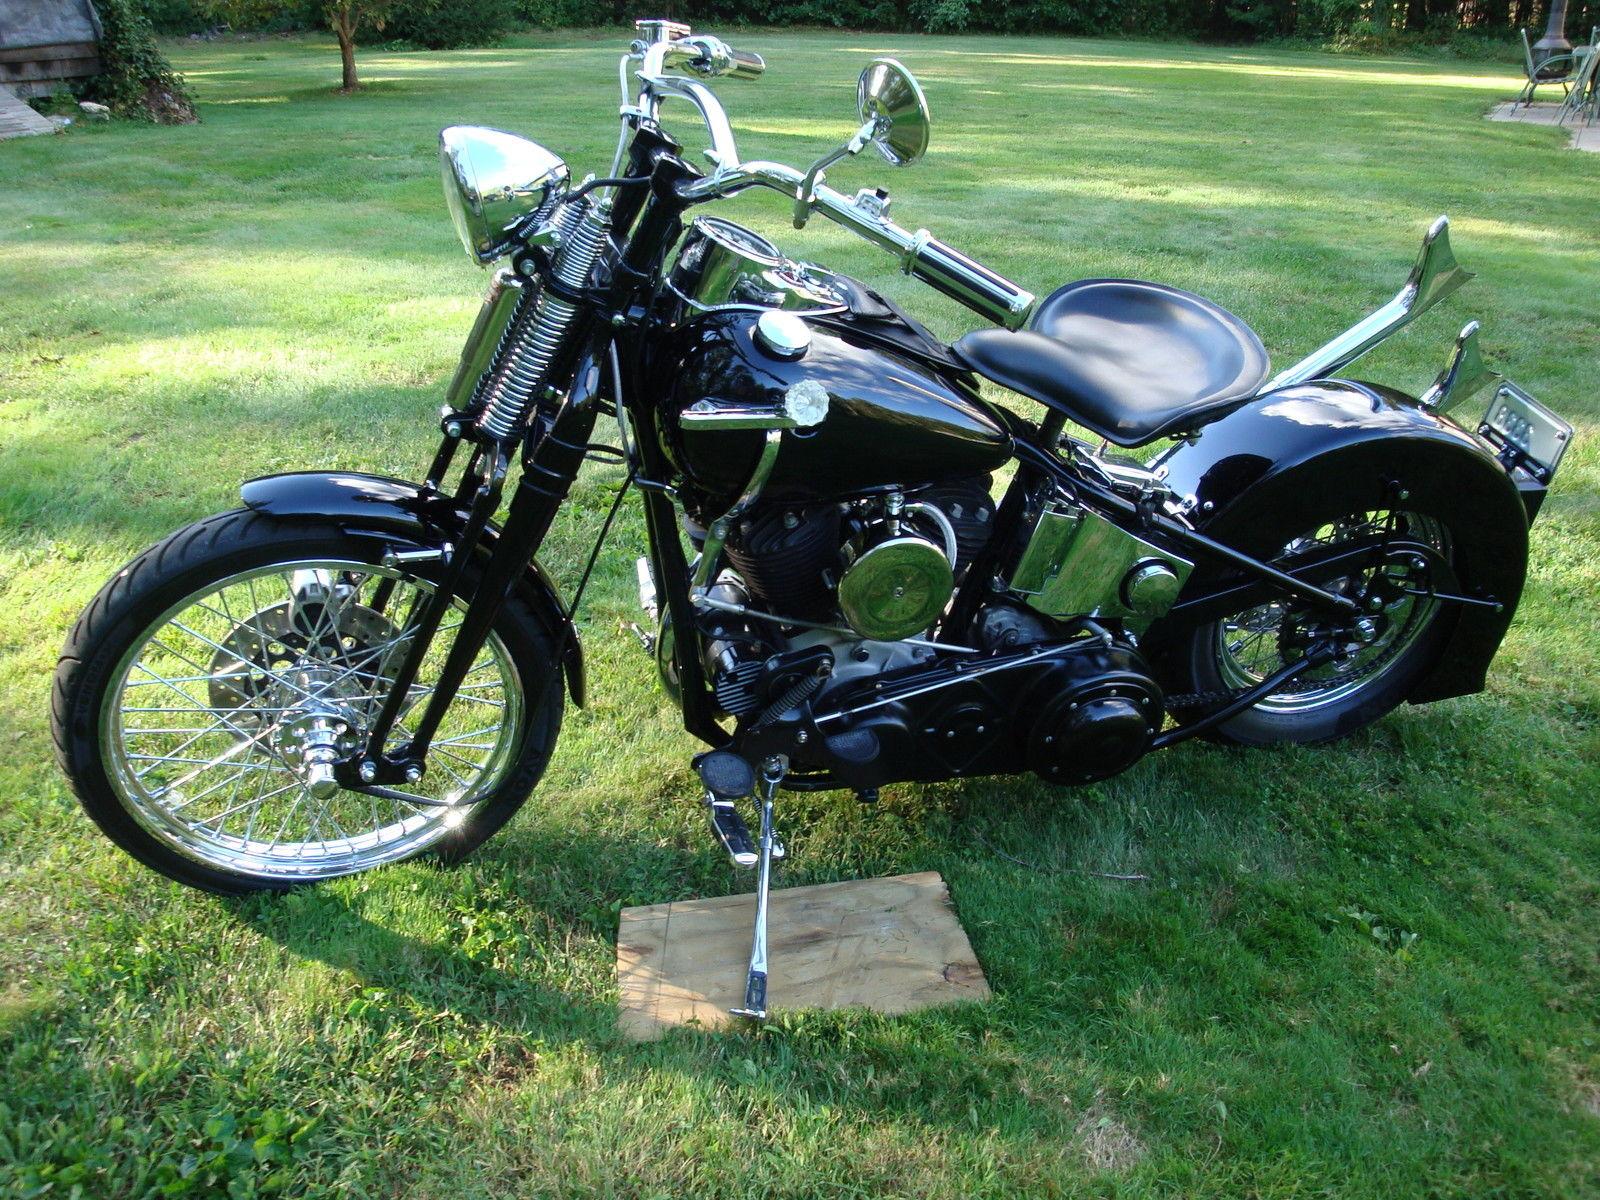 1942 Harley Davidson U 1200 flathead